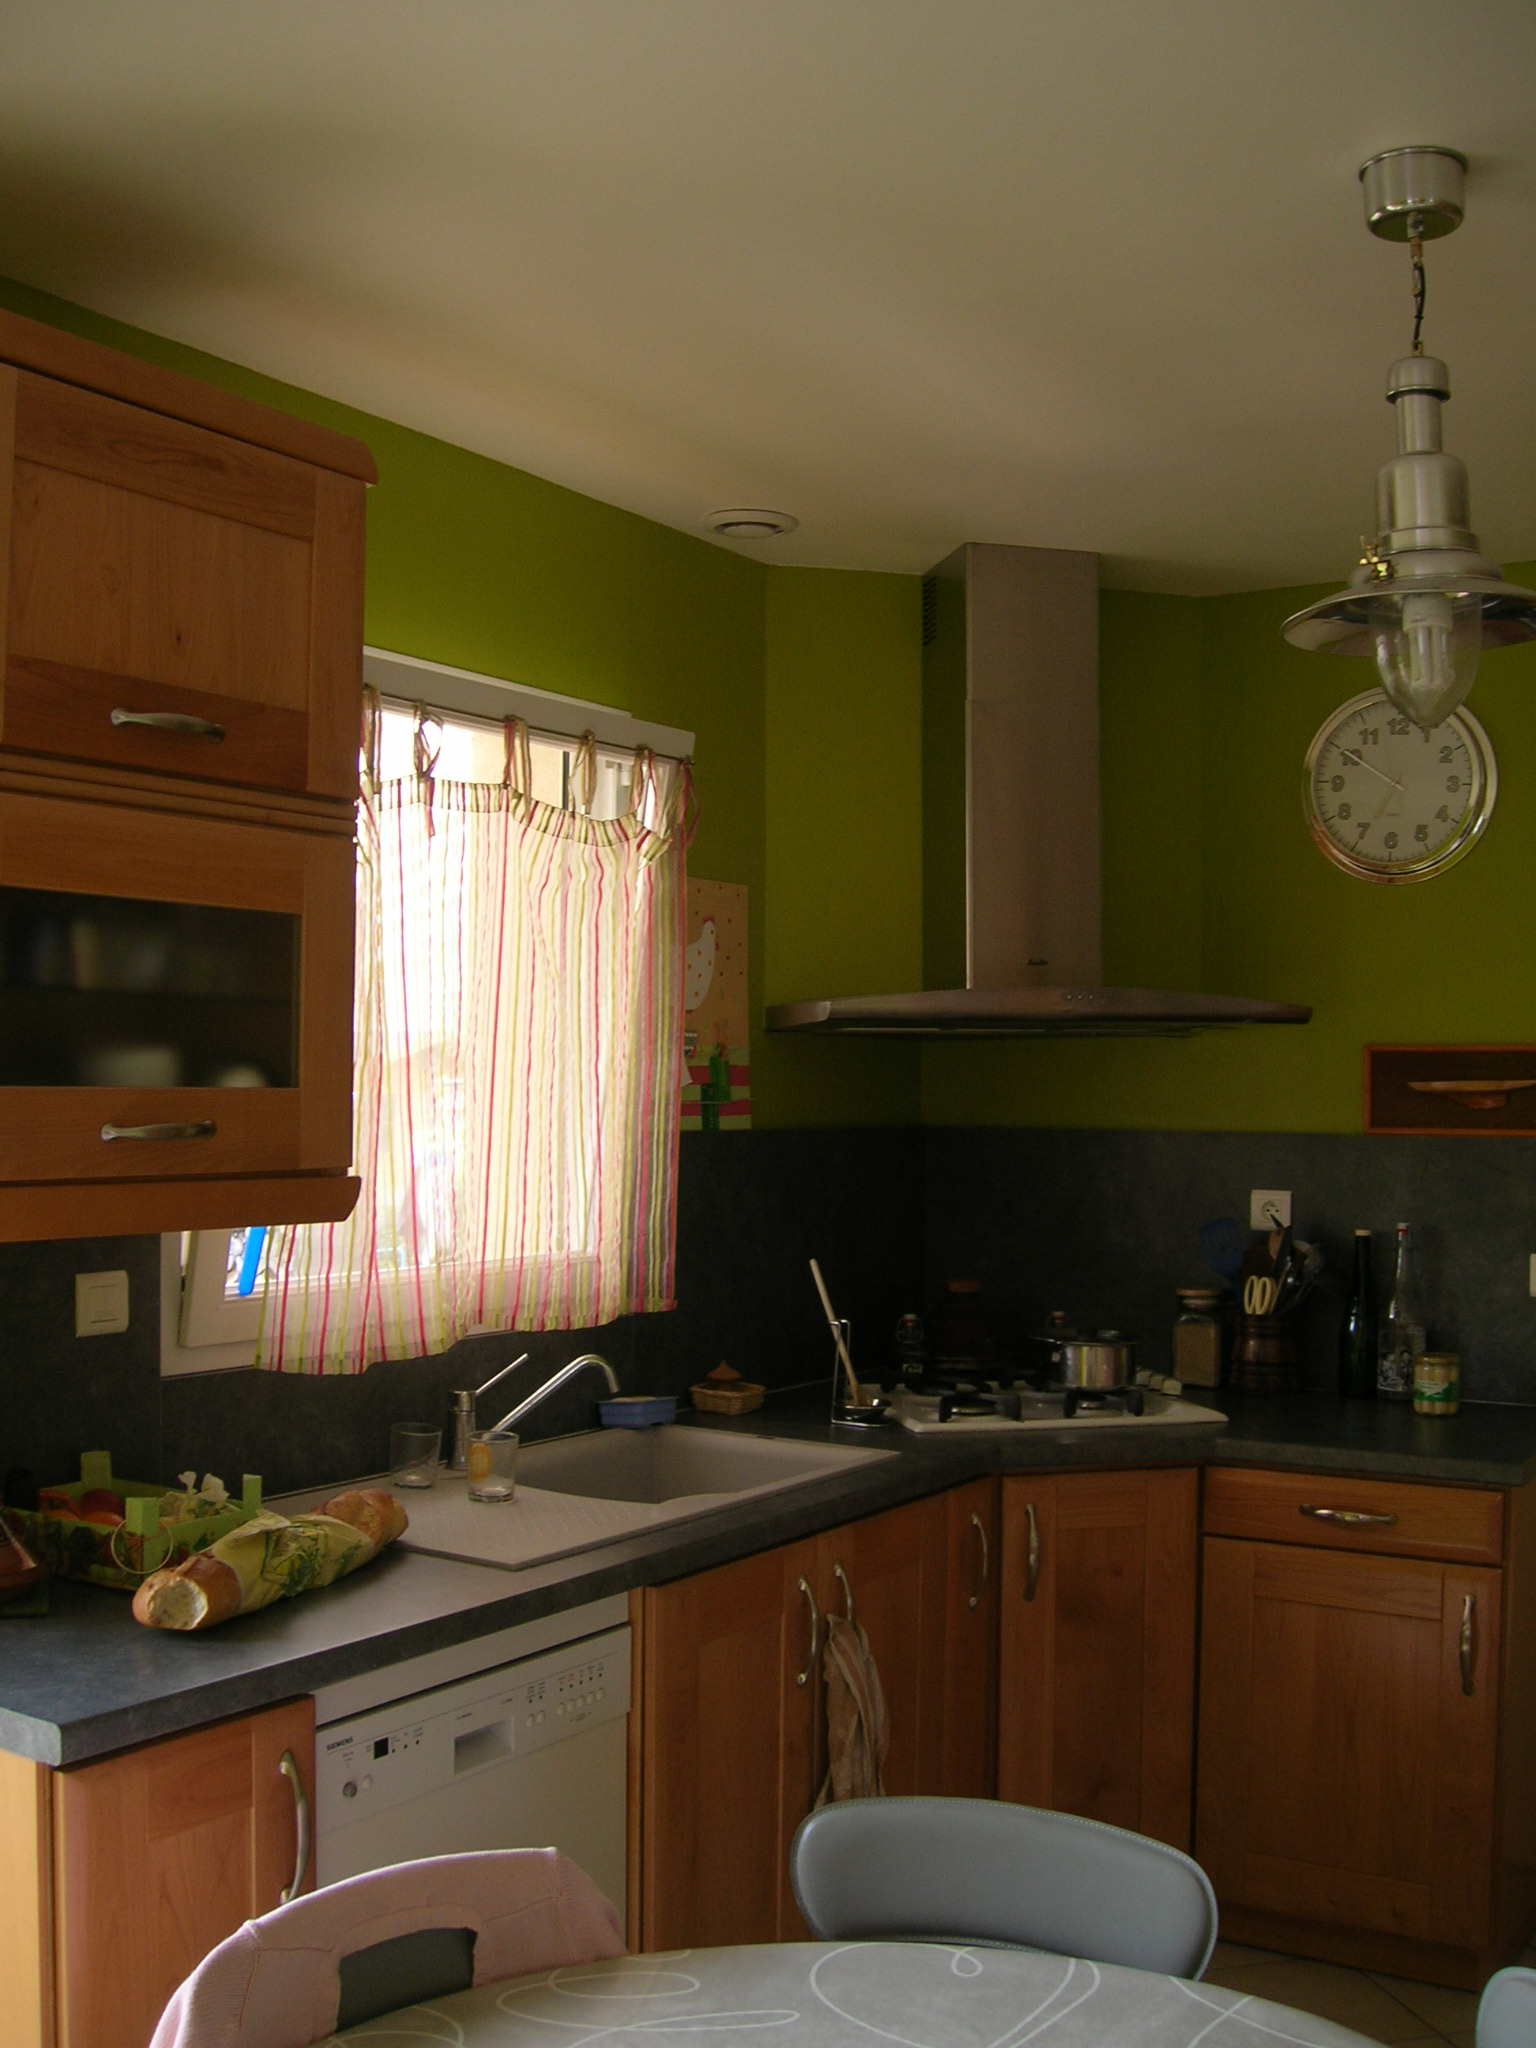 kitchen_guests_house_24h_lemans_b&b